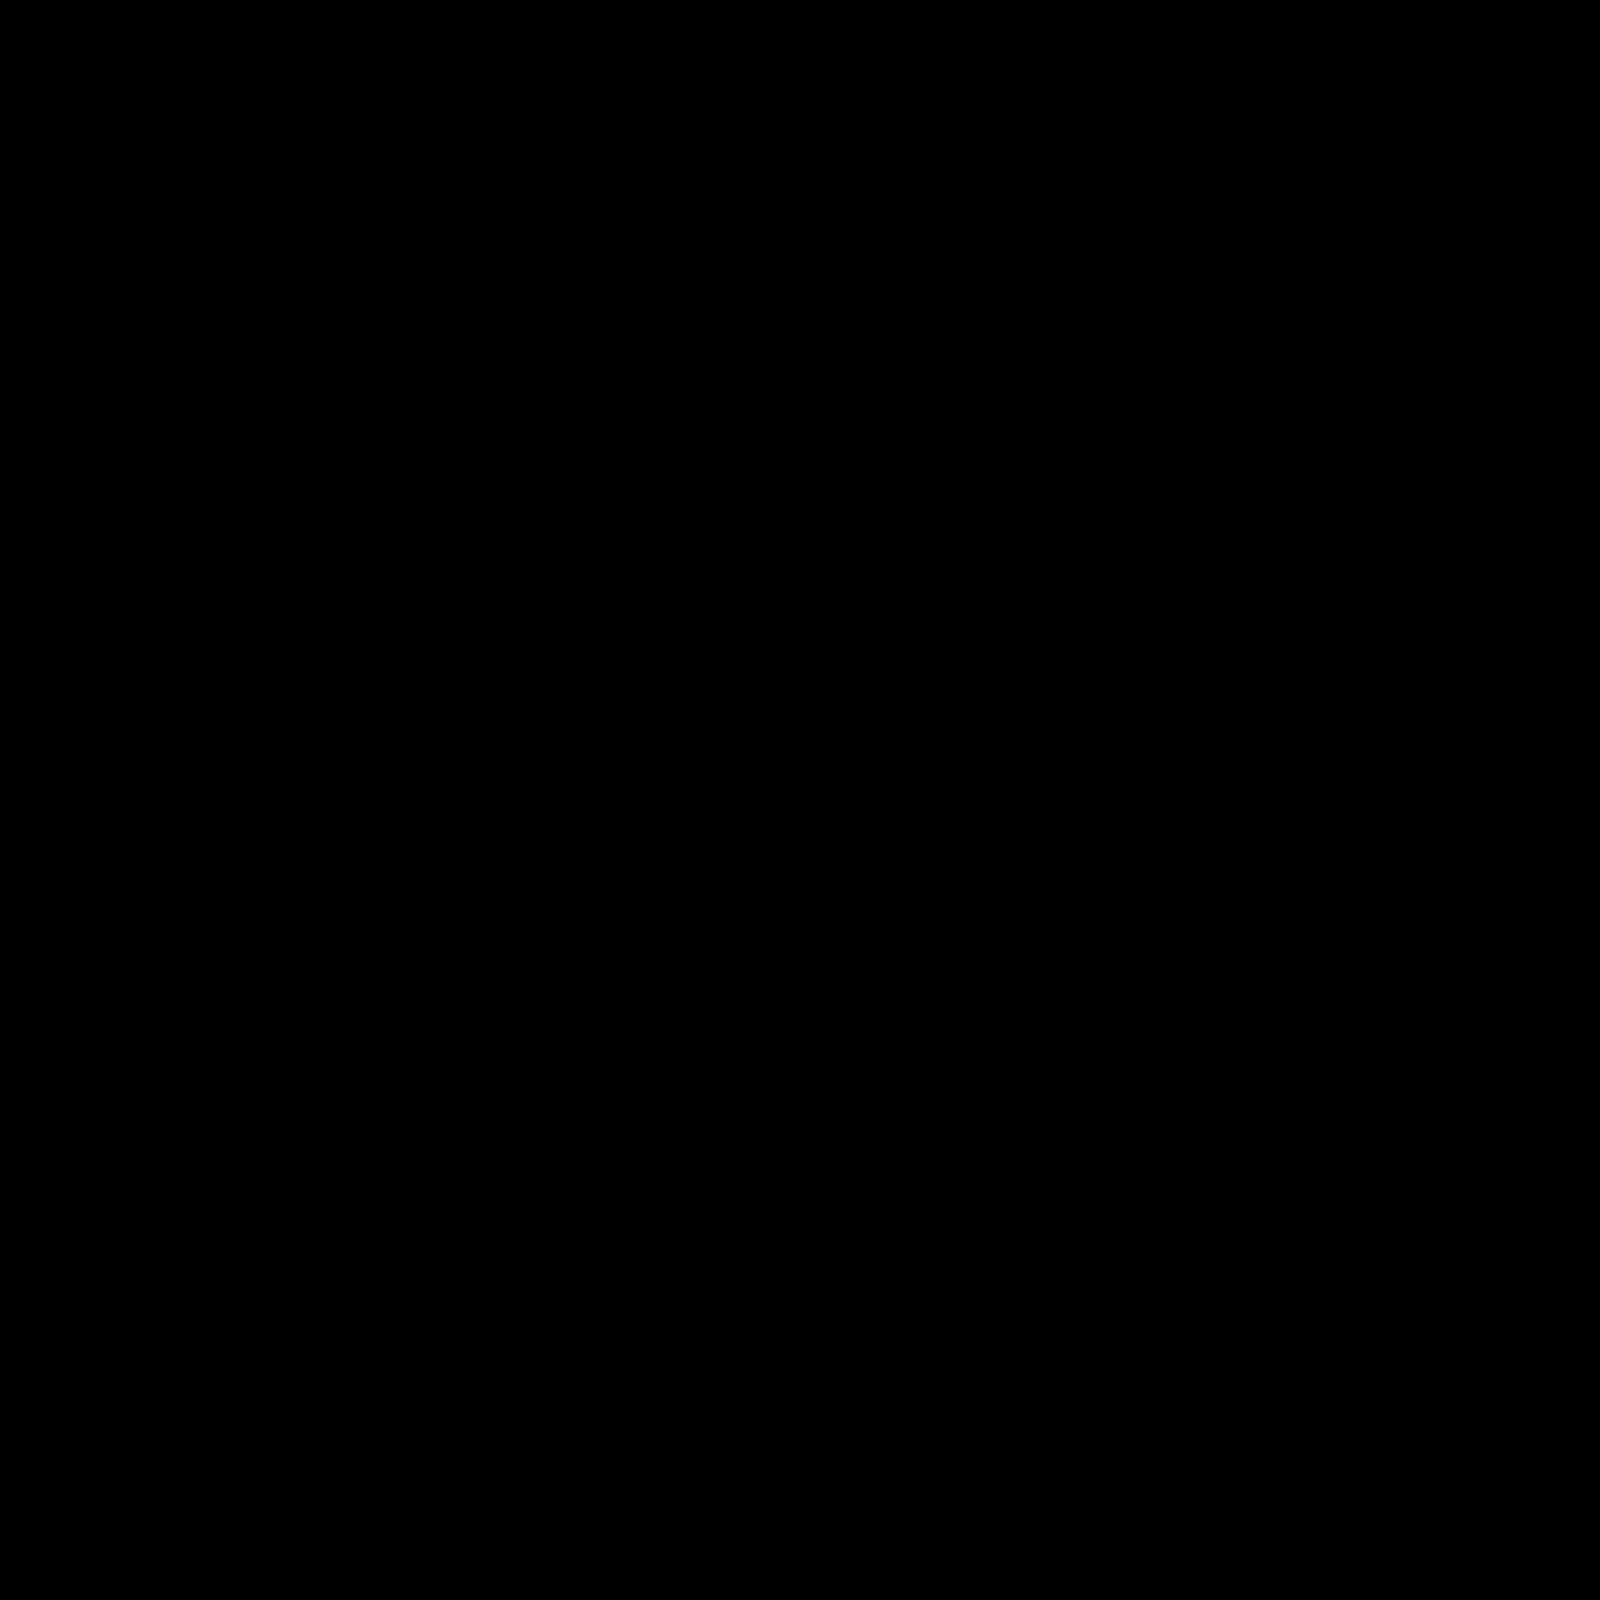 Обоняние icon